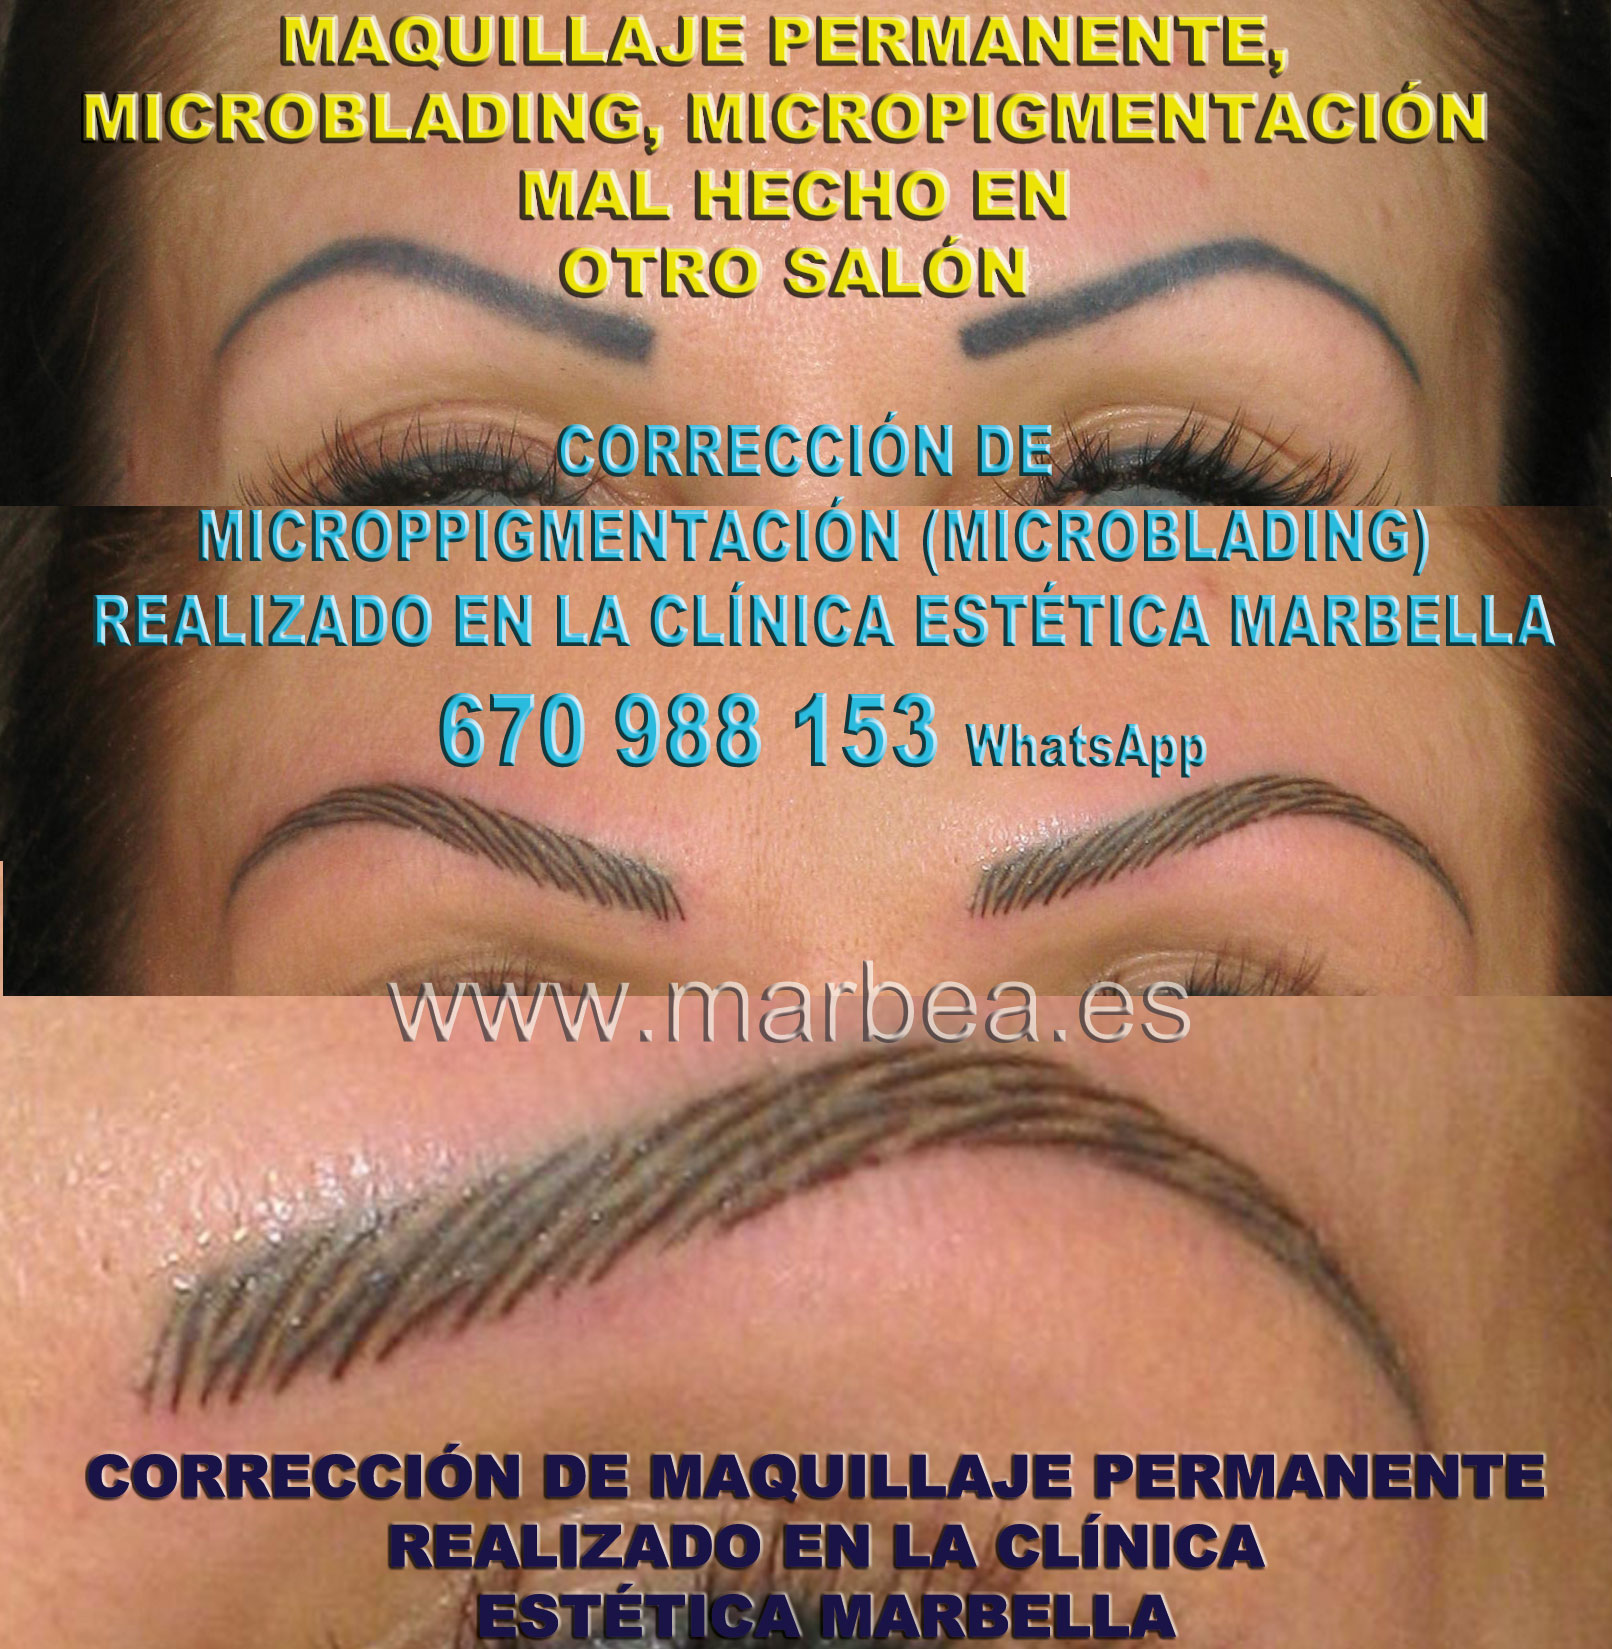 QUITAR TATUAJE CEJAS clínica estética tatuaje ofrece corrección de micropigmentación en cejas,corregir micropigmentación no deseada